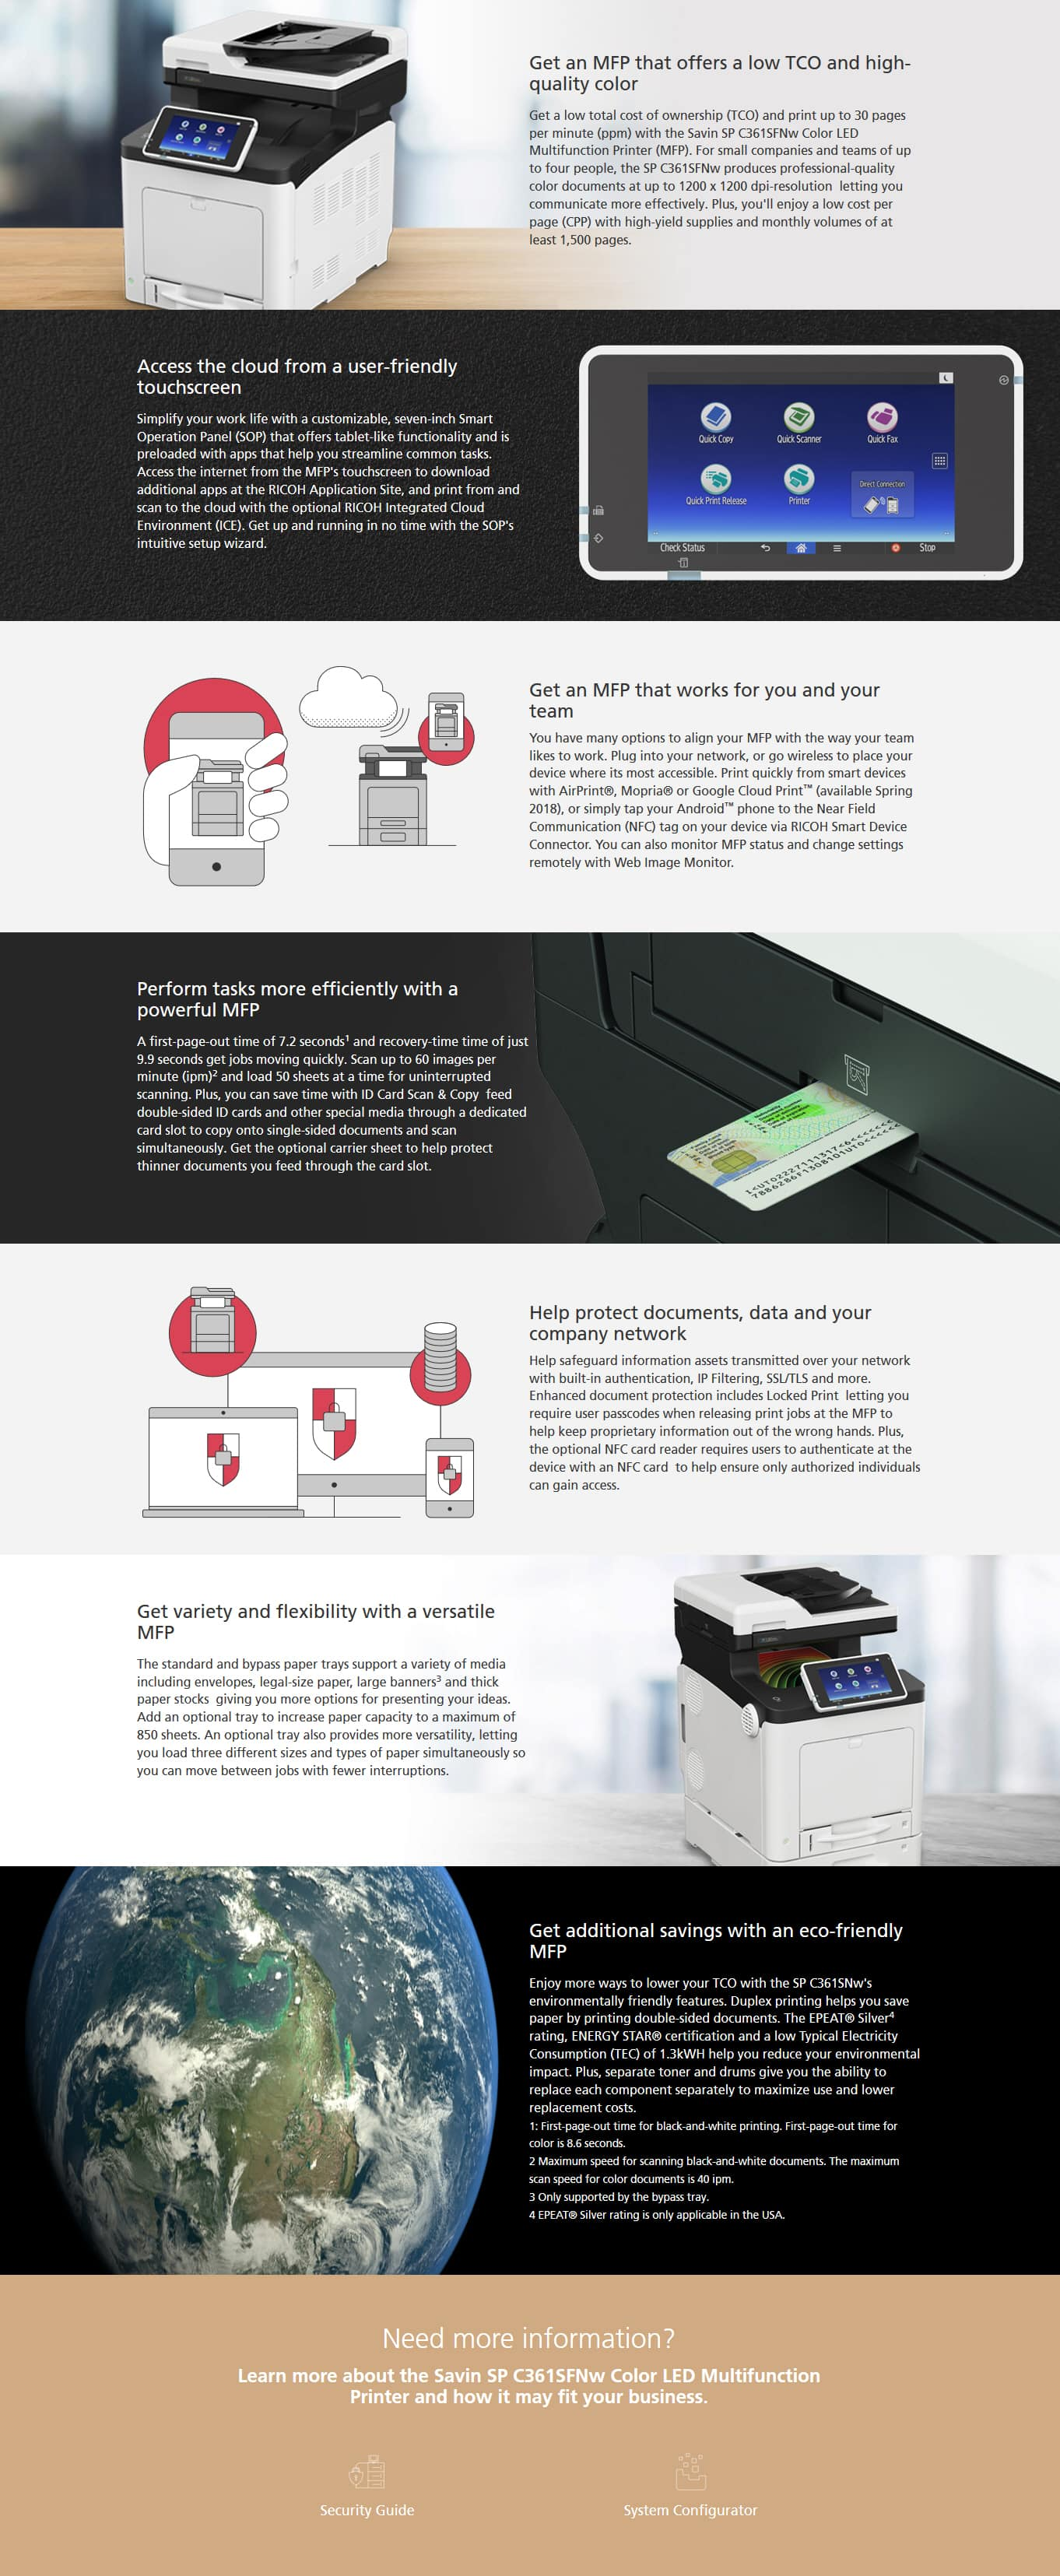 Savin SP C361SFNw Color LED Multifunction Printer 6